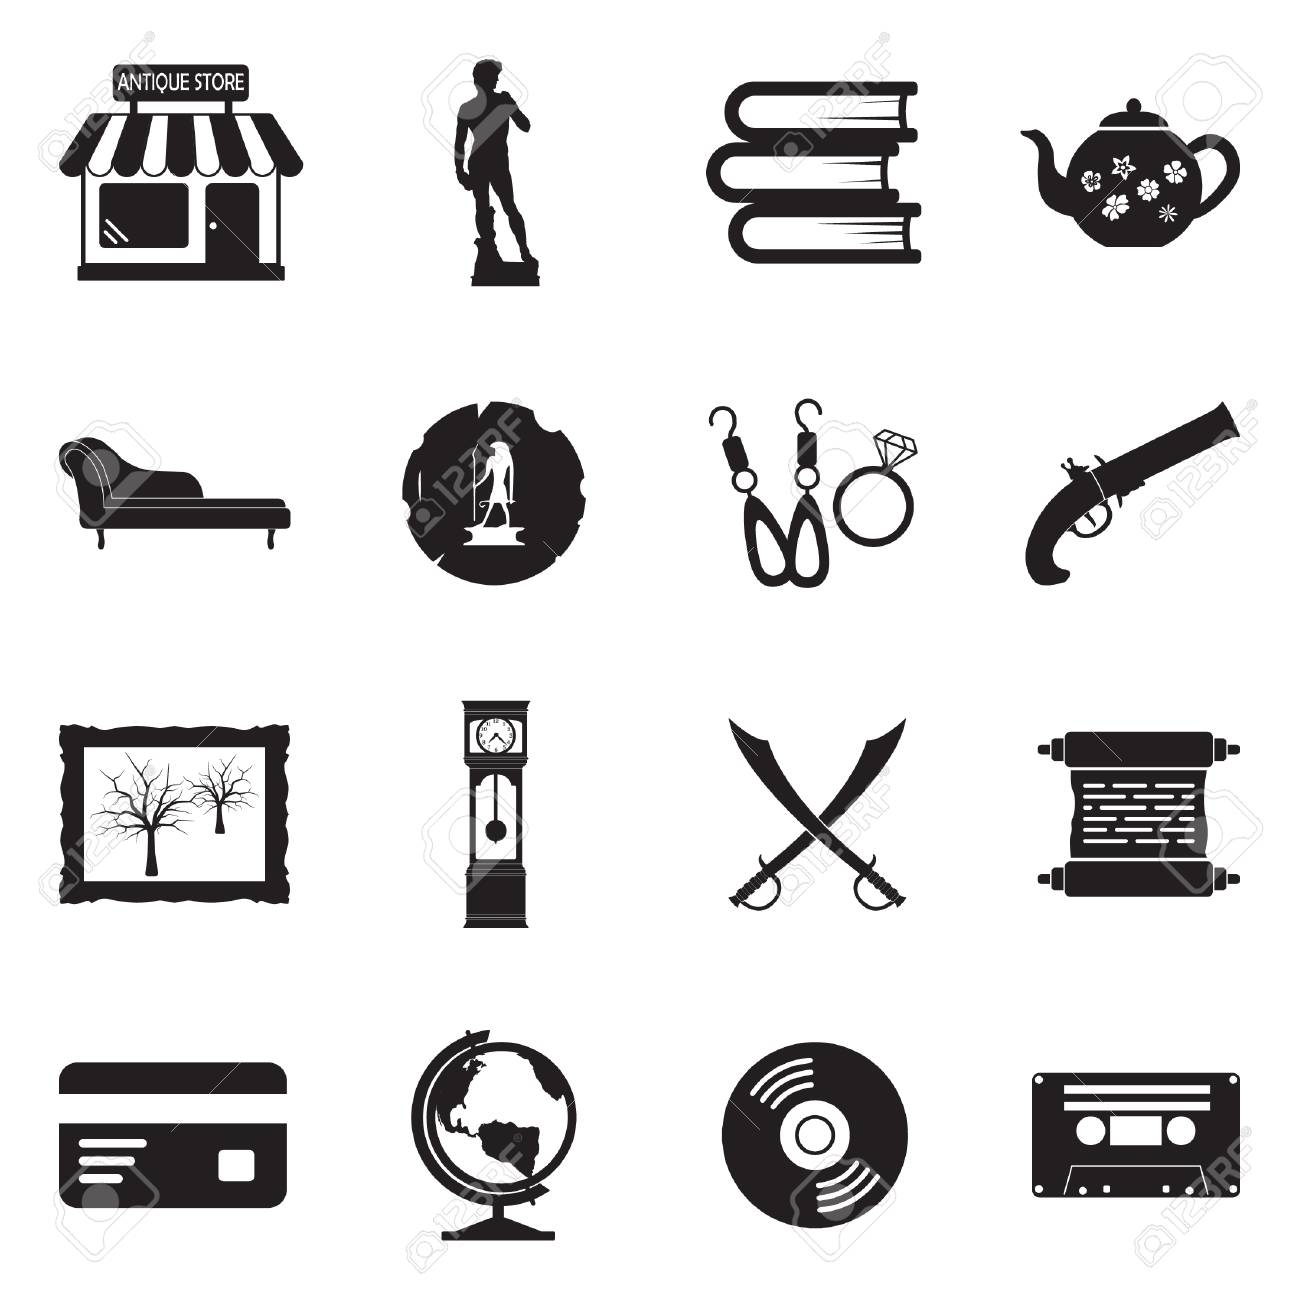 antique store icons black